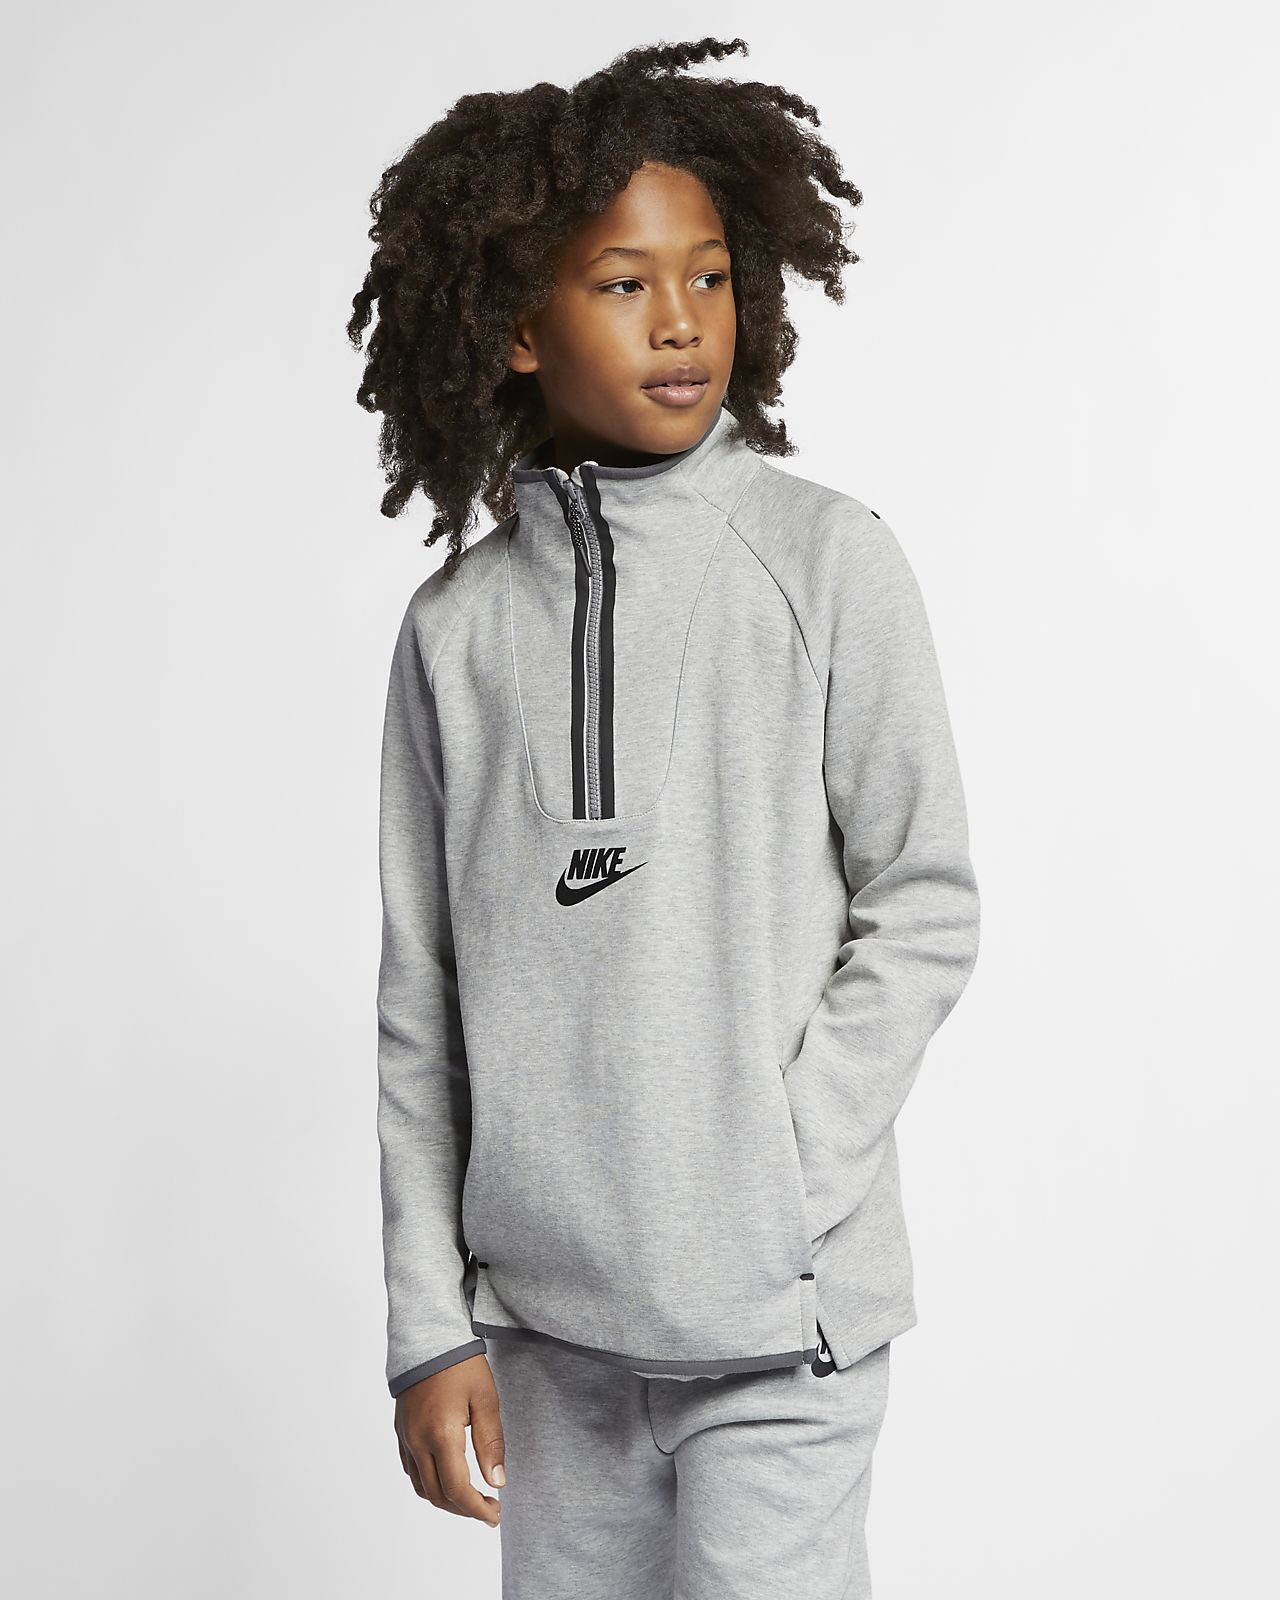 Prenda para la parte superior de manga larga para niños Nike Sportswear Tech Fleece